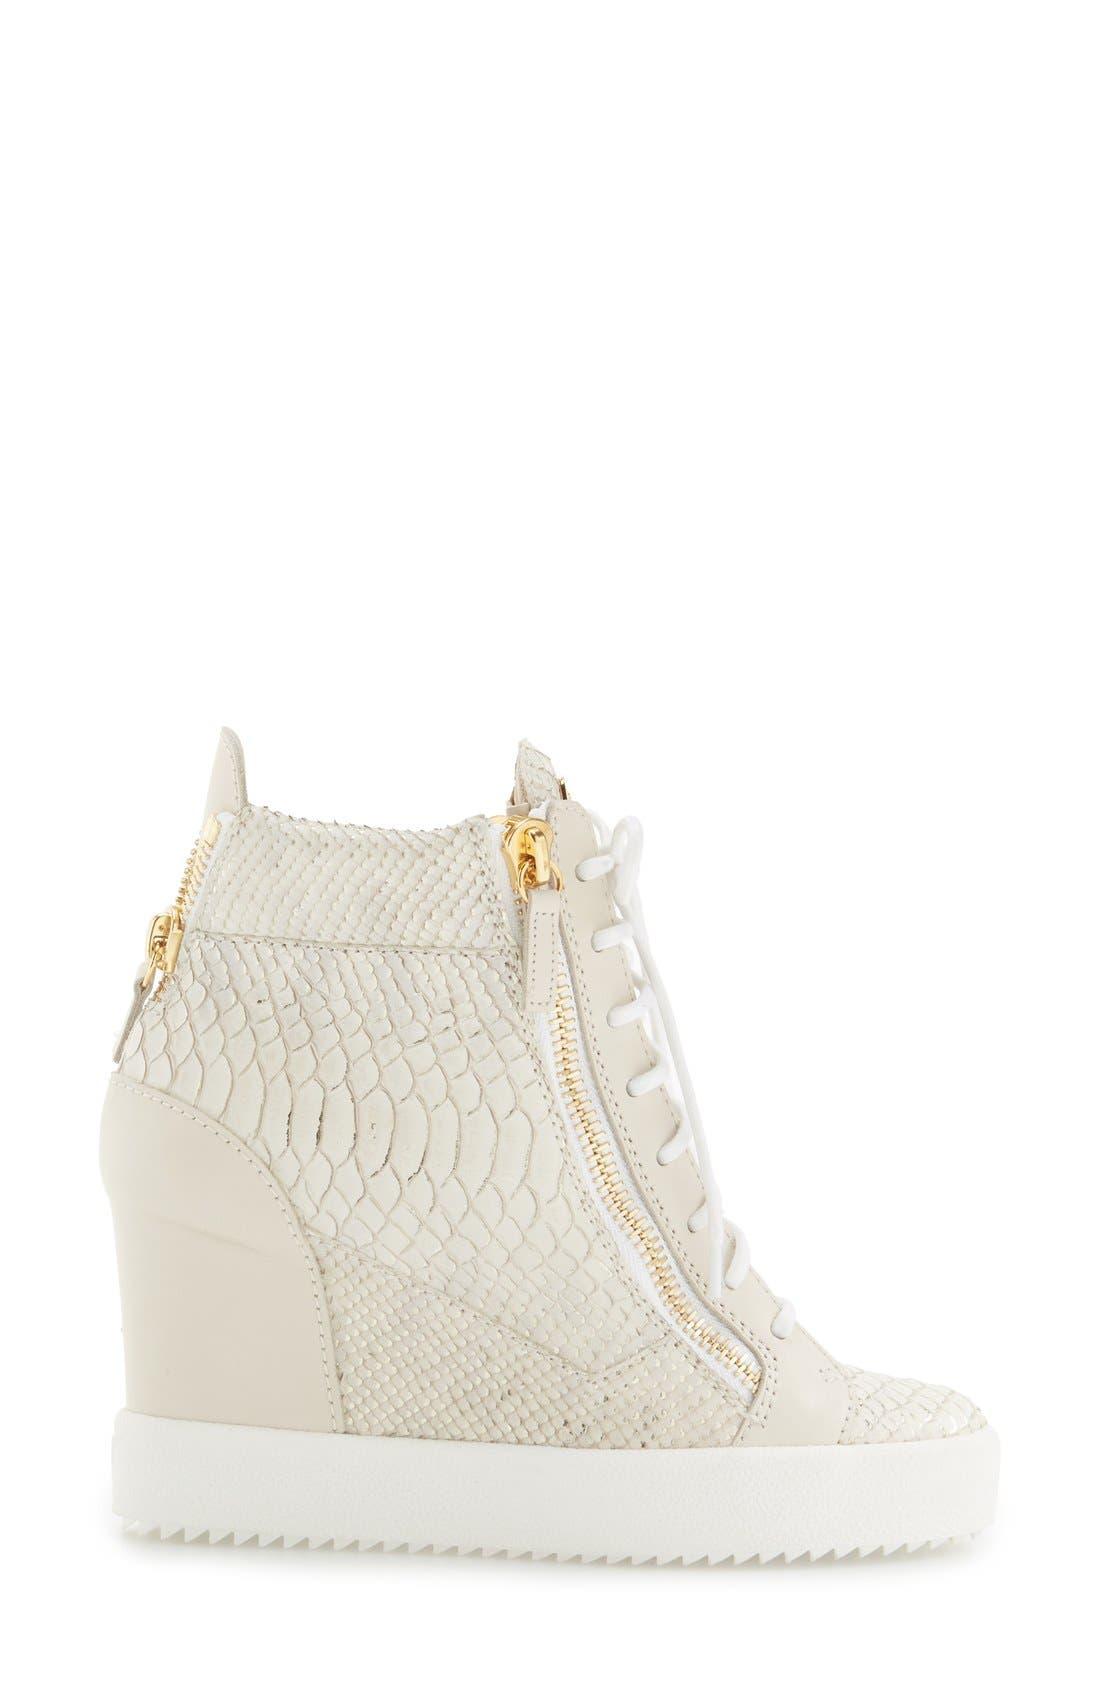 GIUSEPPE ZANOTTI,                             Ofelia Wedge Sneaker,                             Alternate thumbnail 4, color,                             040